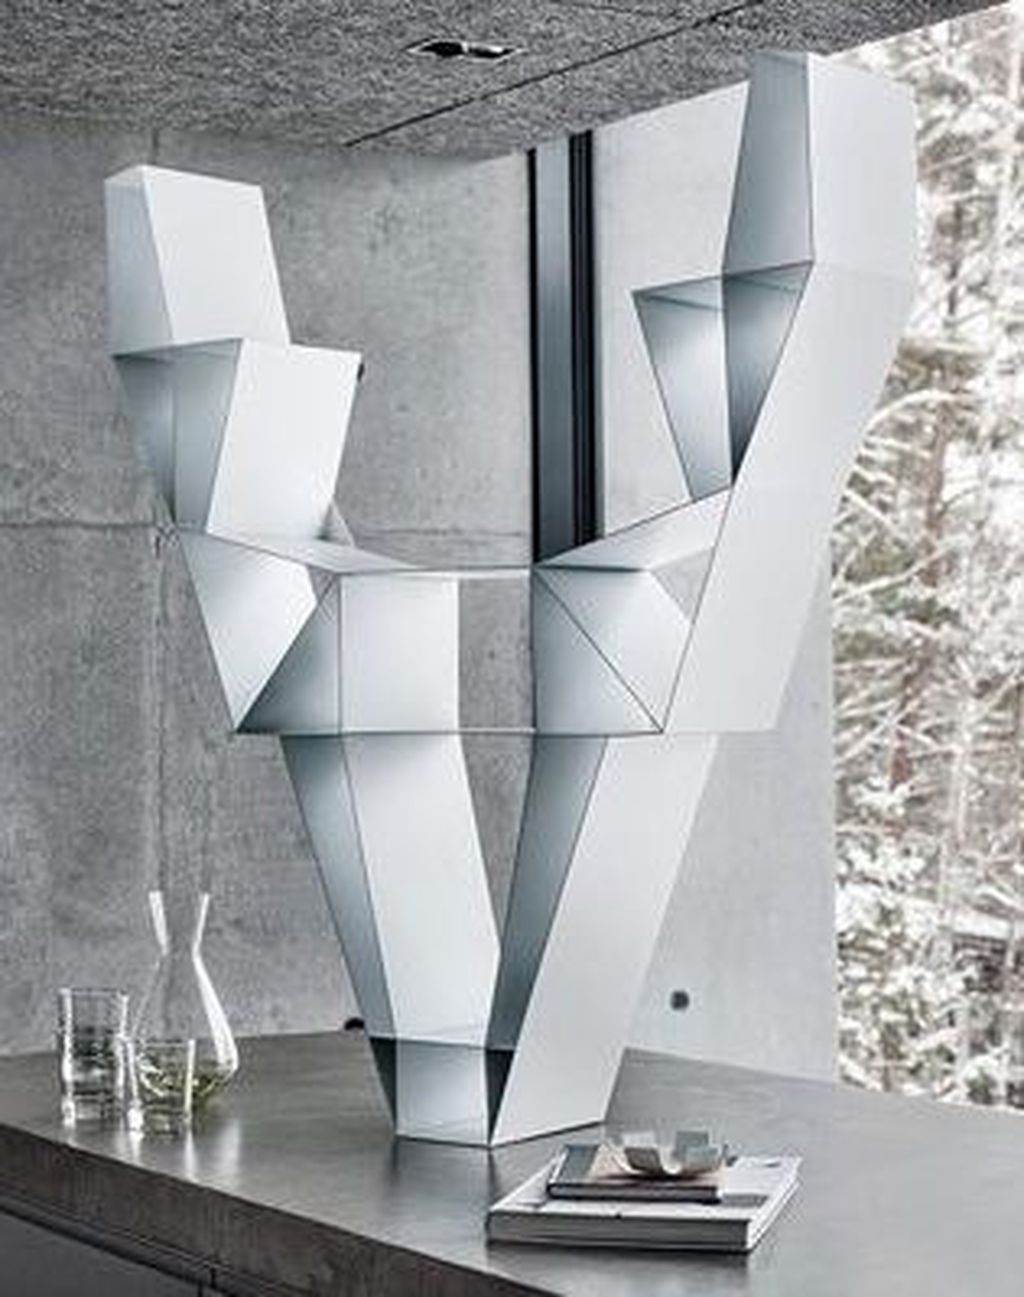 Splendid Deer Shelf Design Ideas With Minimalist Scandinavian Style To Try 21